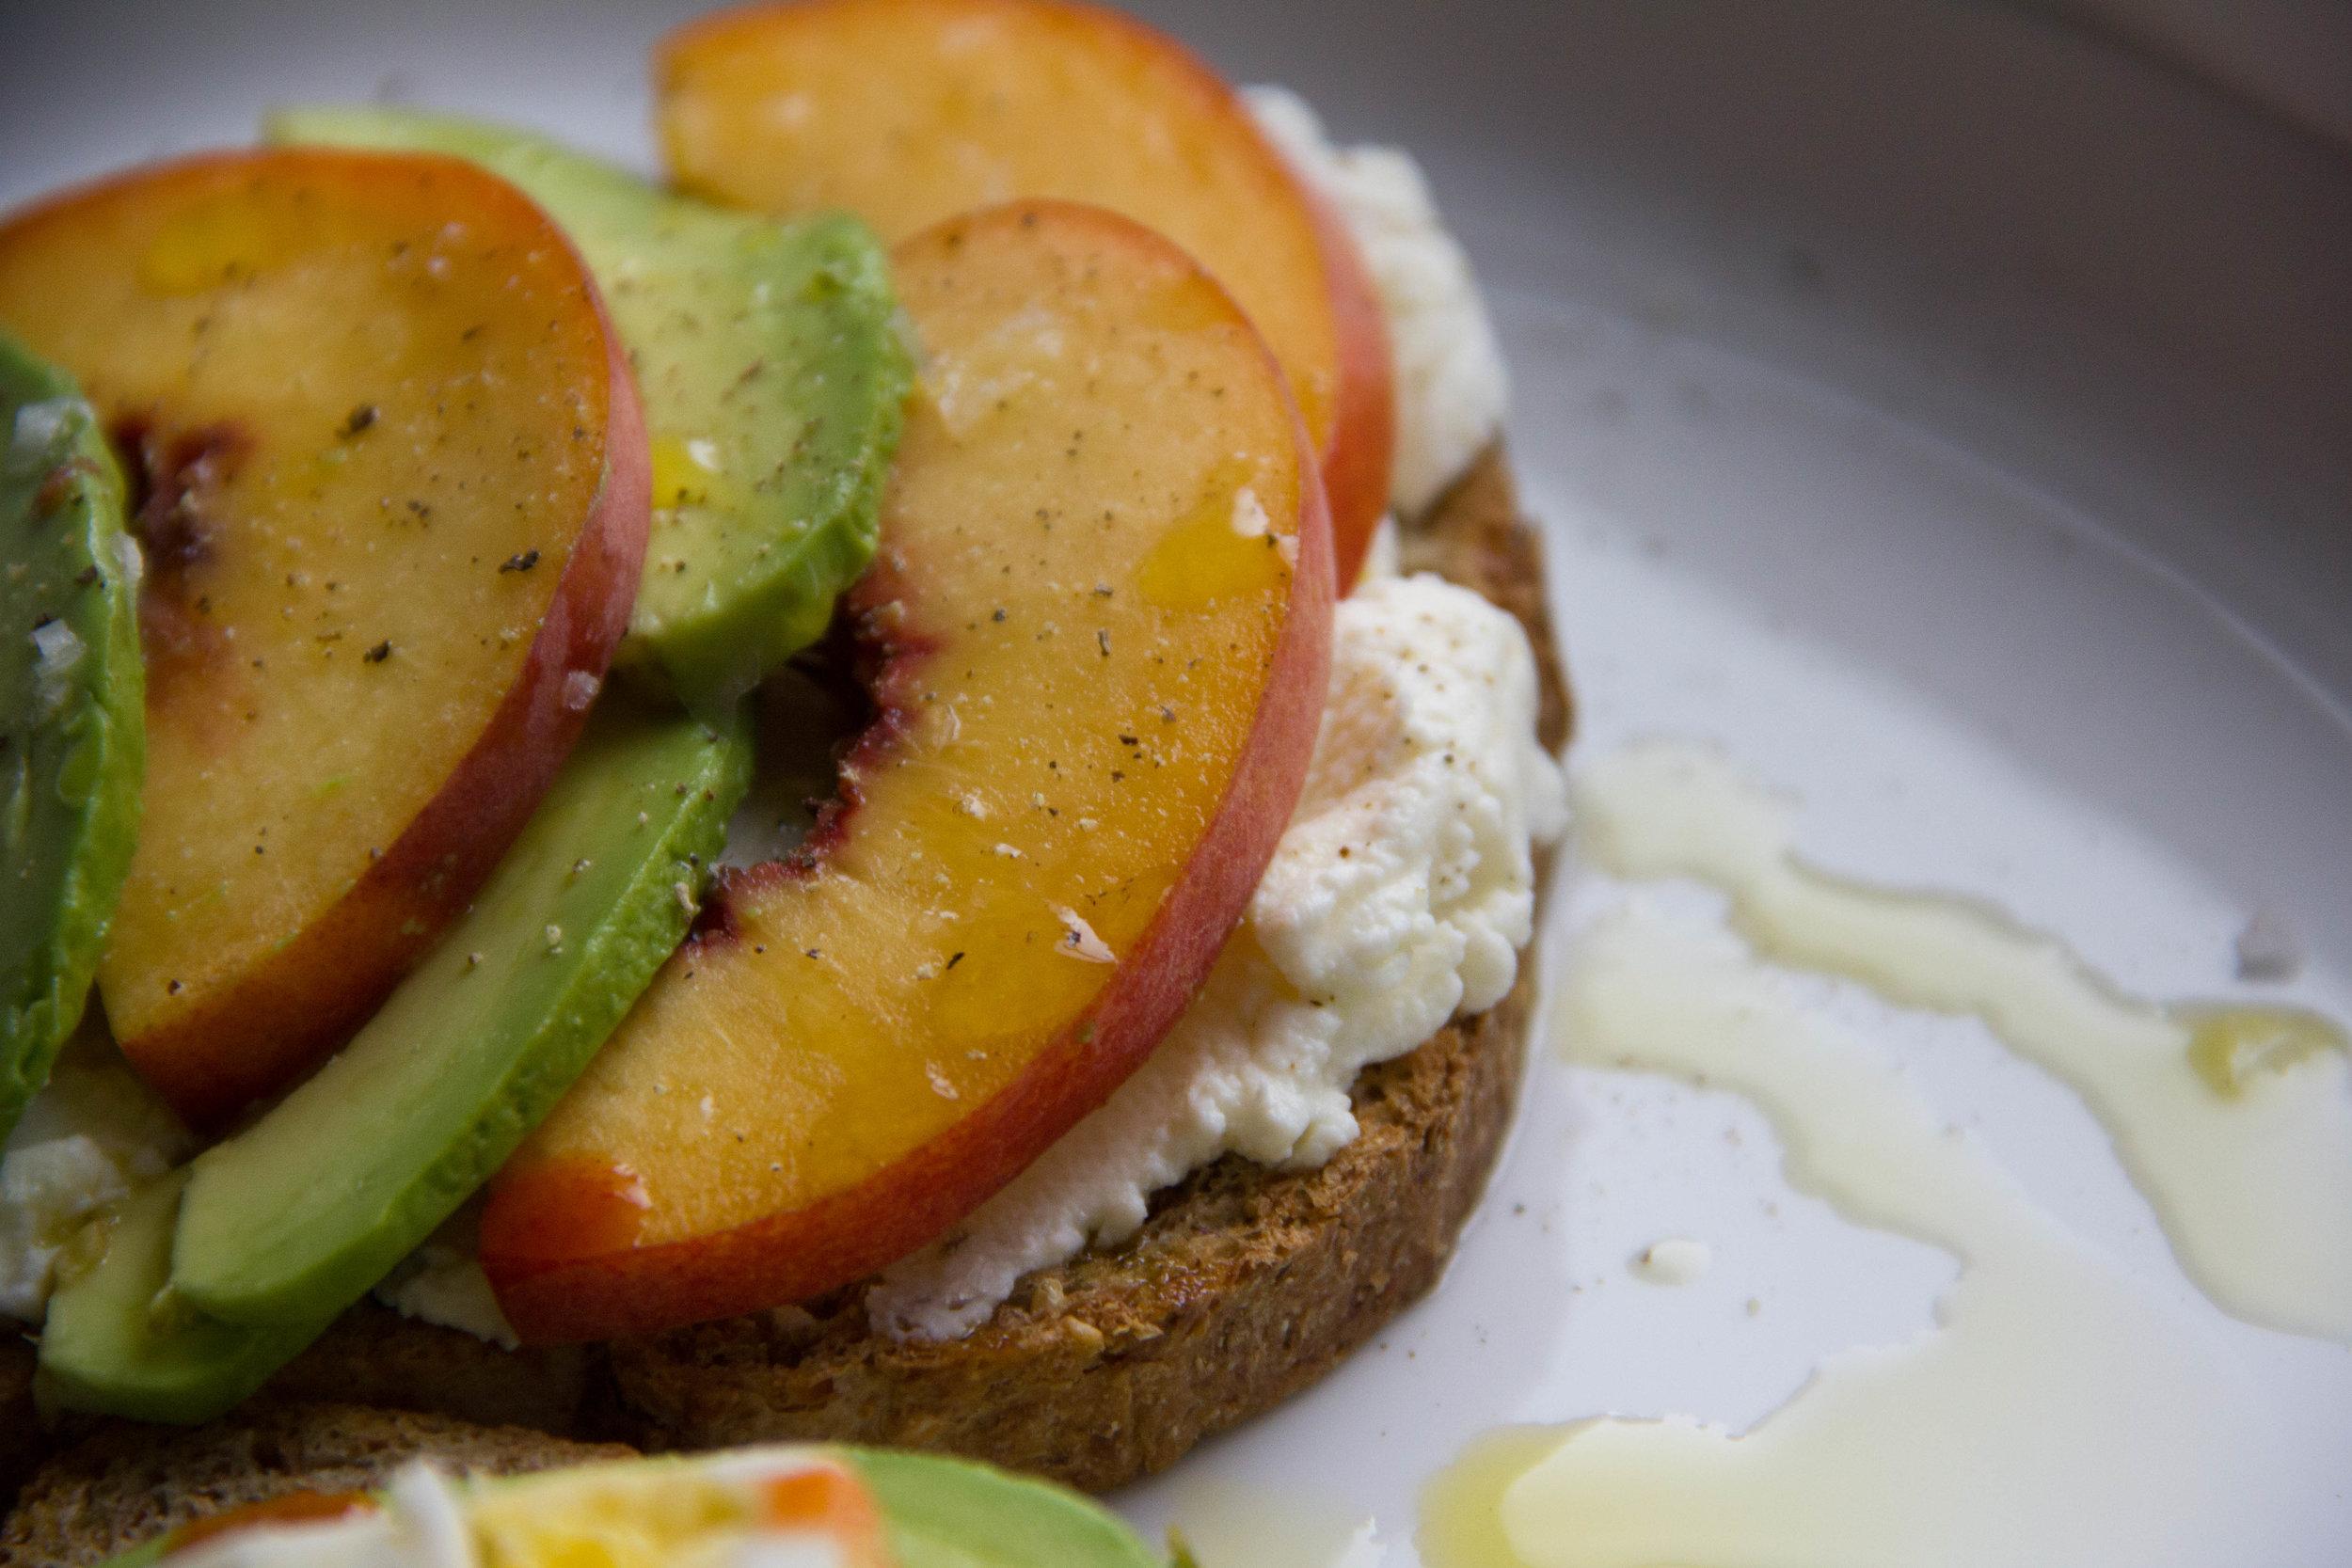 Peach & Ricotta Avocado Toast